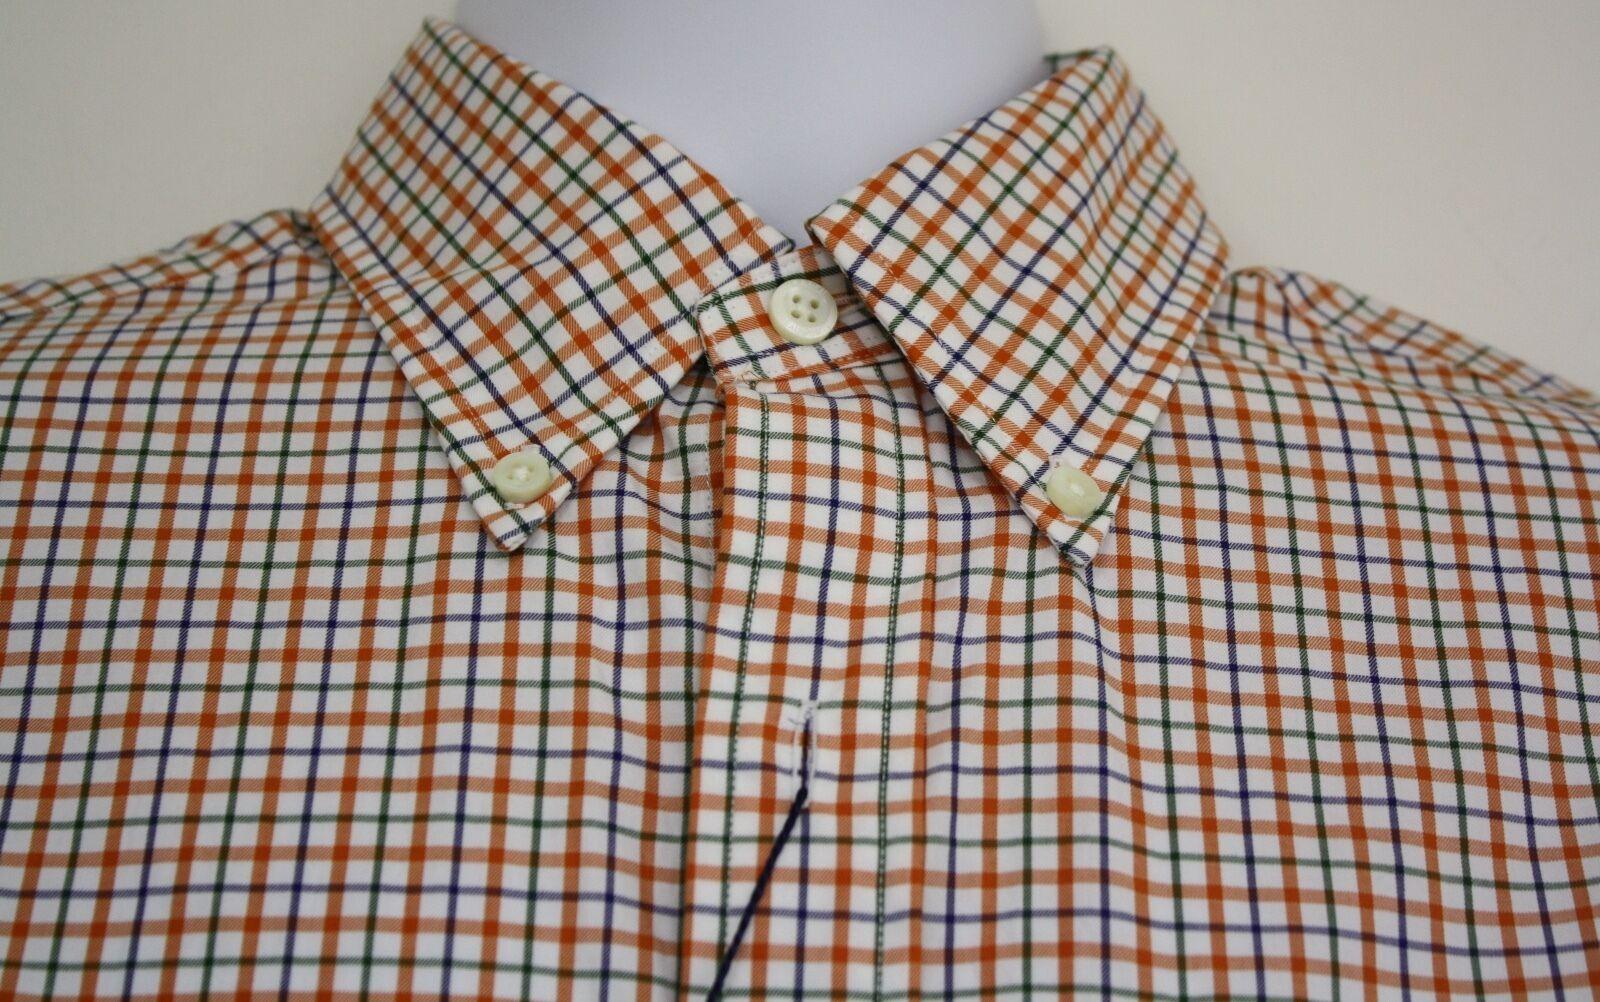 Ralph Lauren Polo Shirt orange Plaid Cotton NEW RET 145 Long Sleeve Small